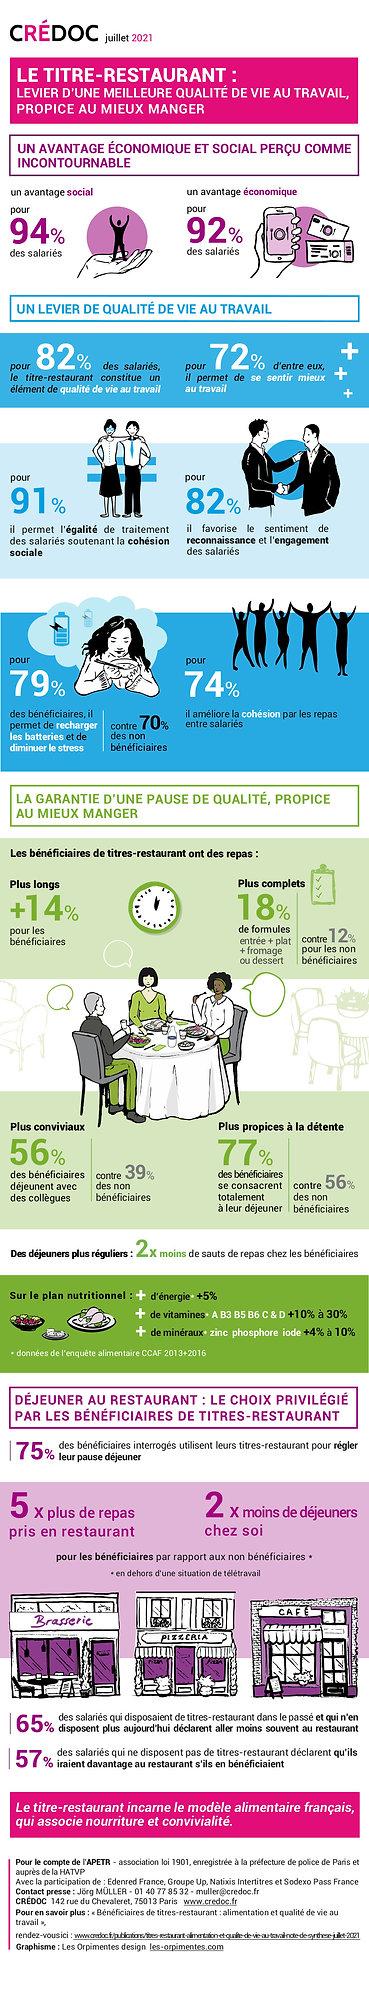 Infographie Titre-restaurant Juillet 2021 CREDOC.jpg